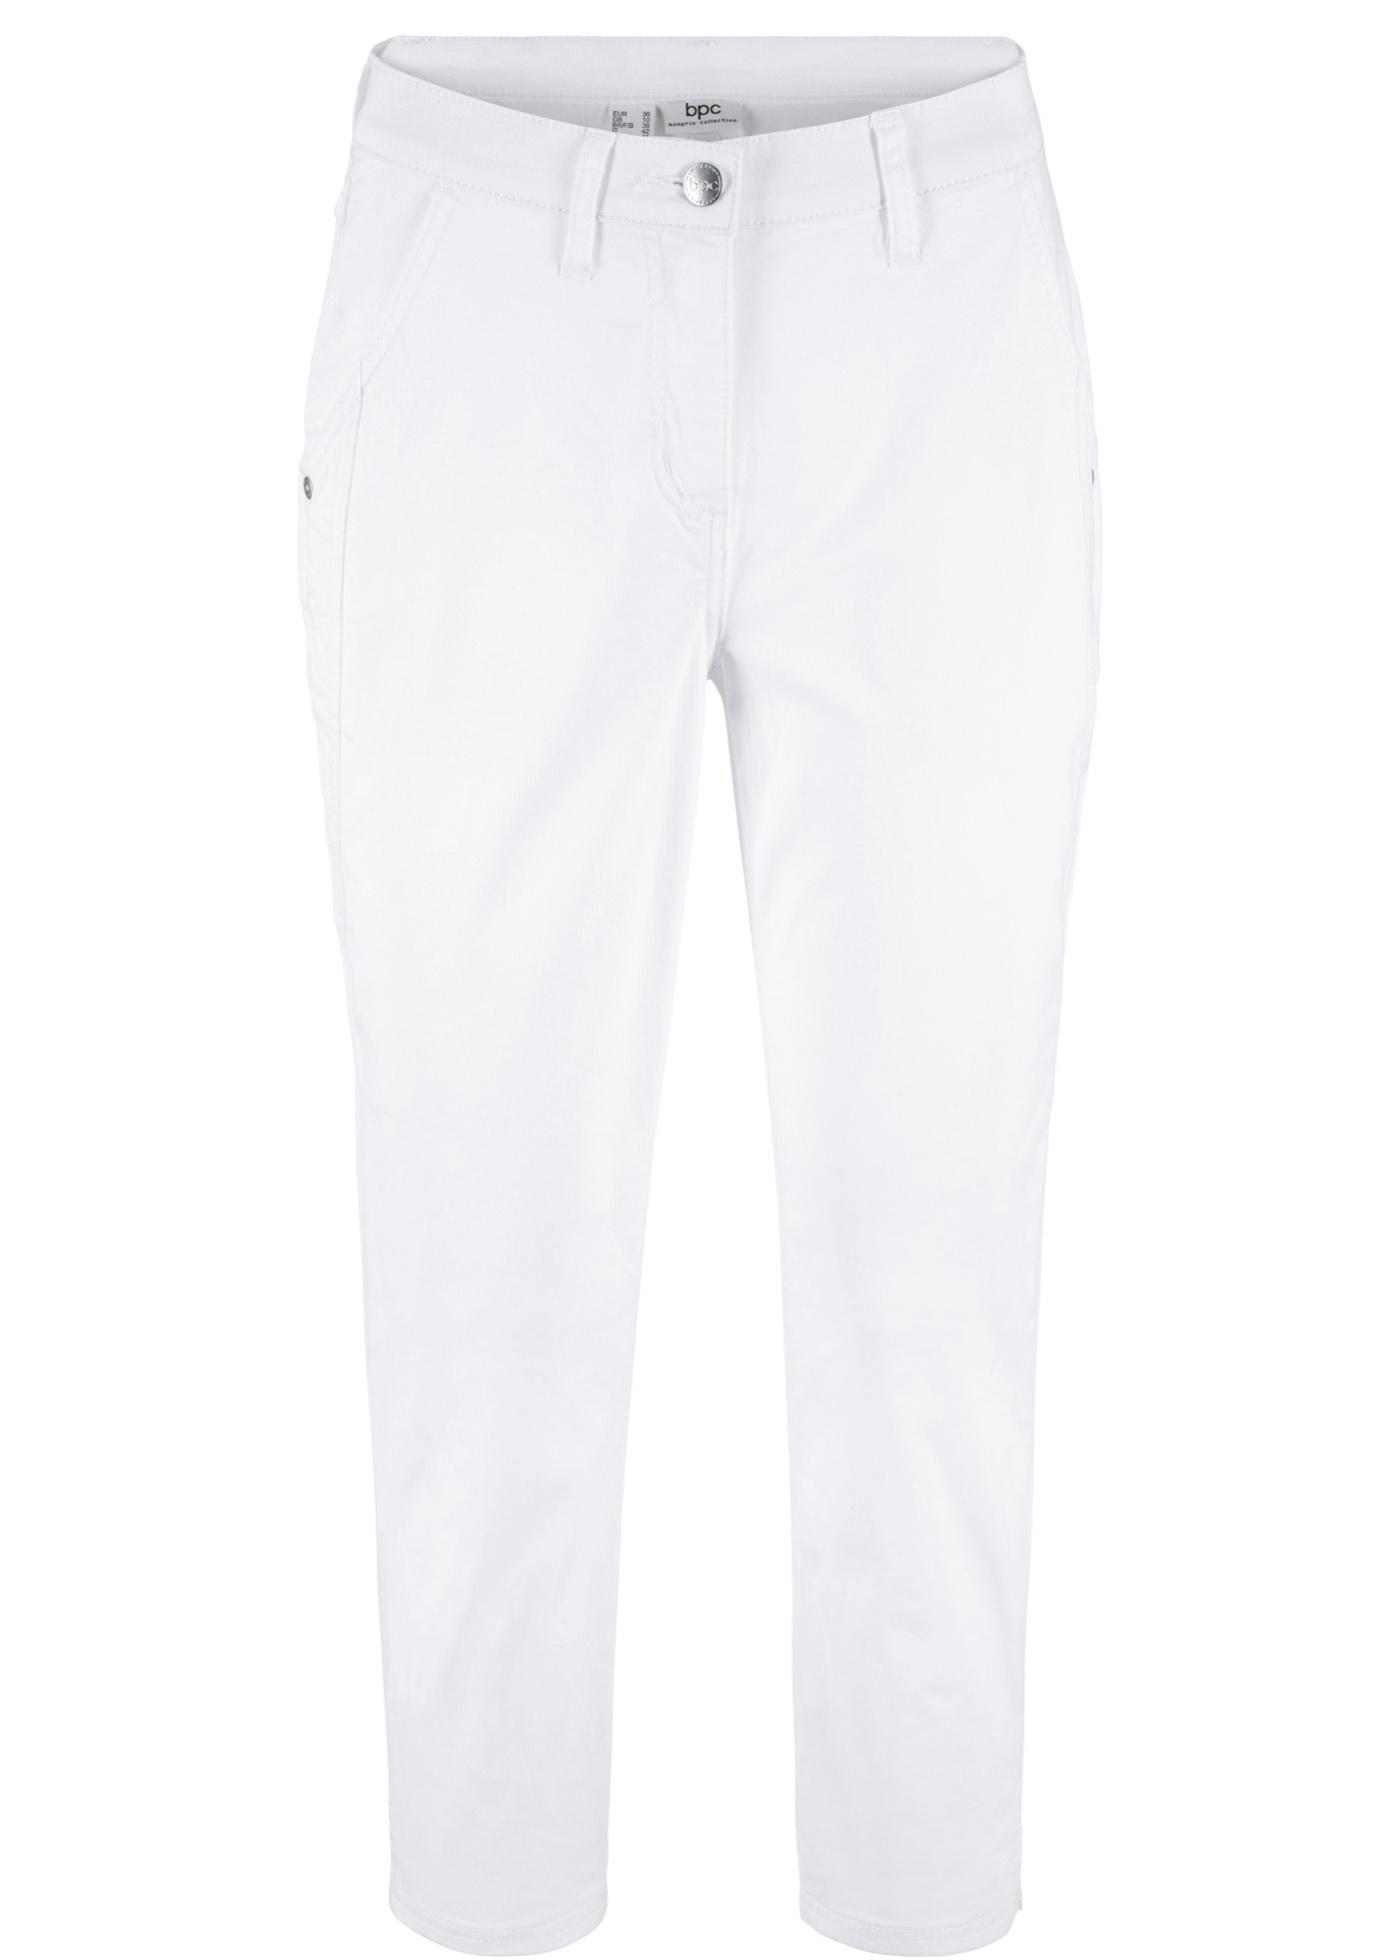 3 CollectionPantalon 4Slim Bpc Blanc Bonprix Fit Pour Femme eIYDWEH92